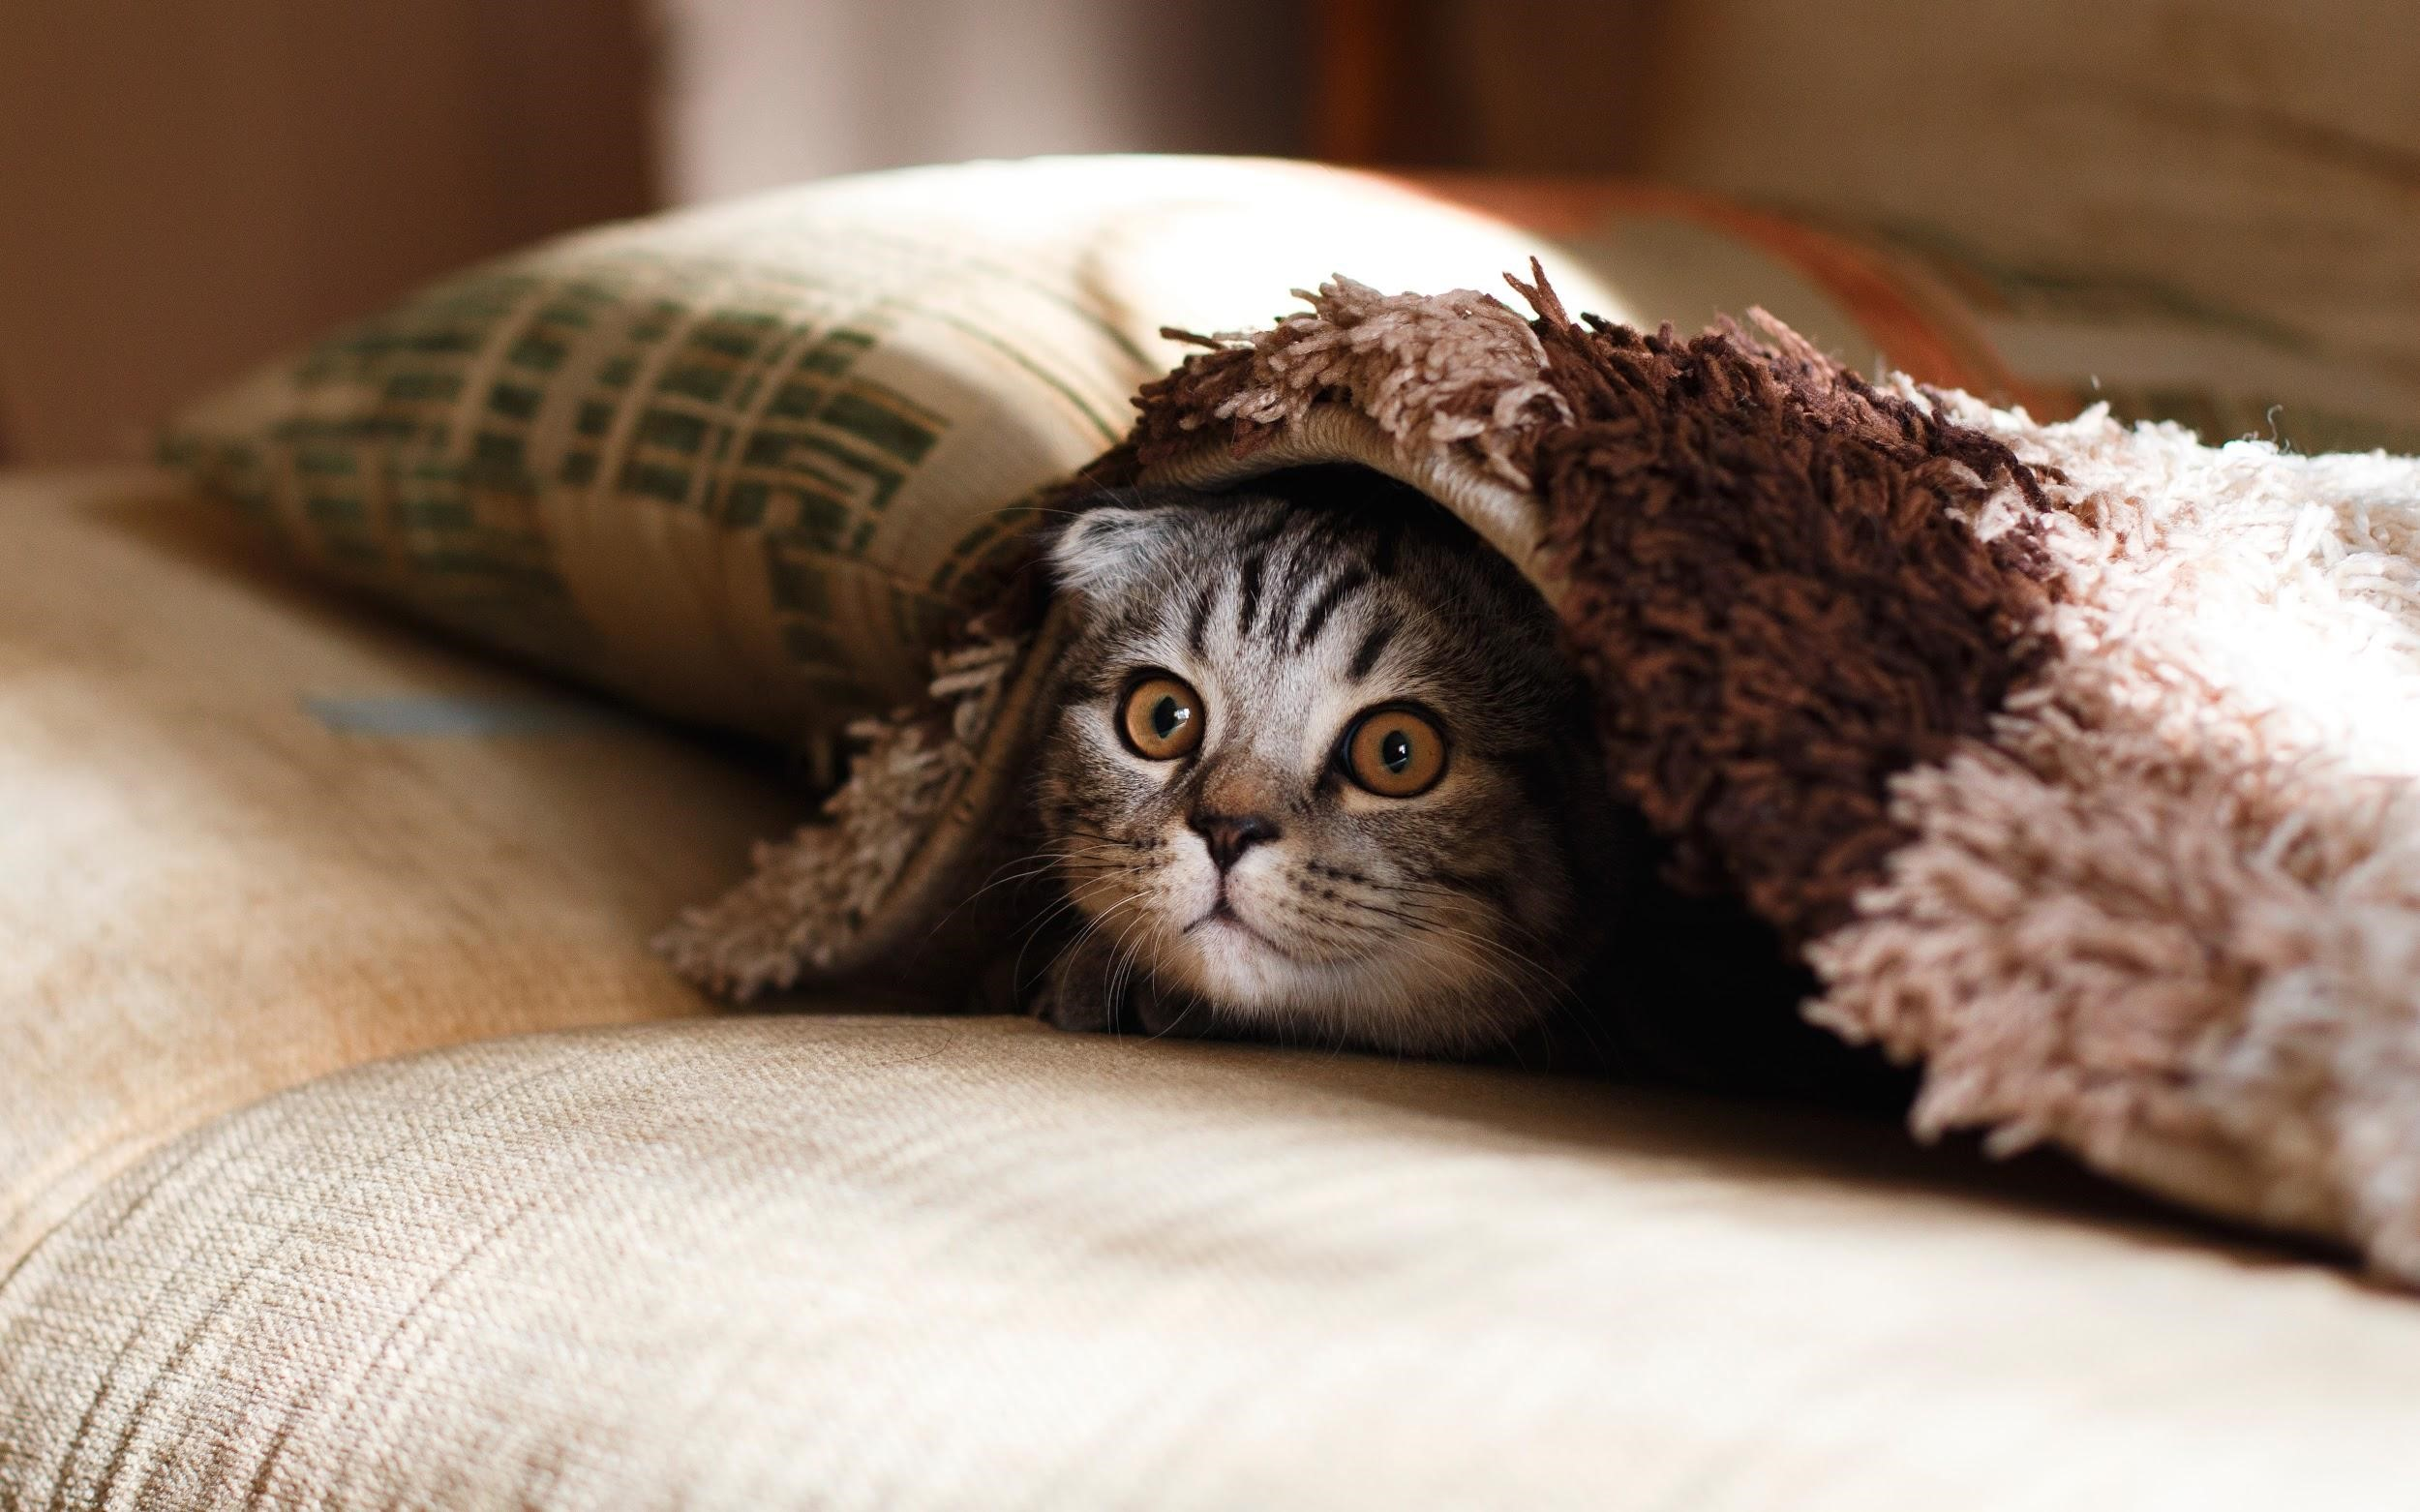 The Wondrous Catnip: 3 Reasons Why Kitties Love It